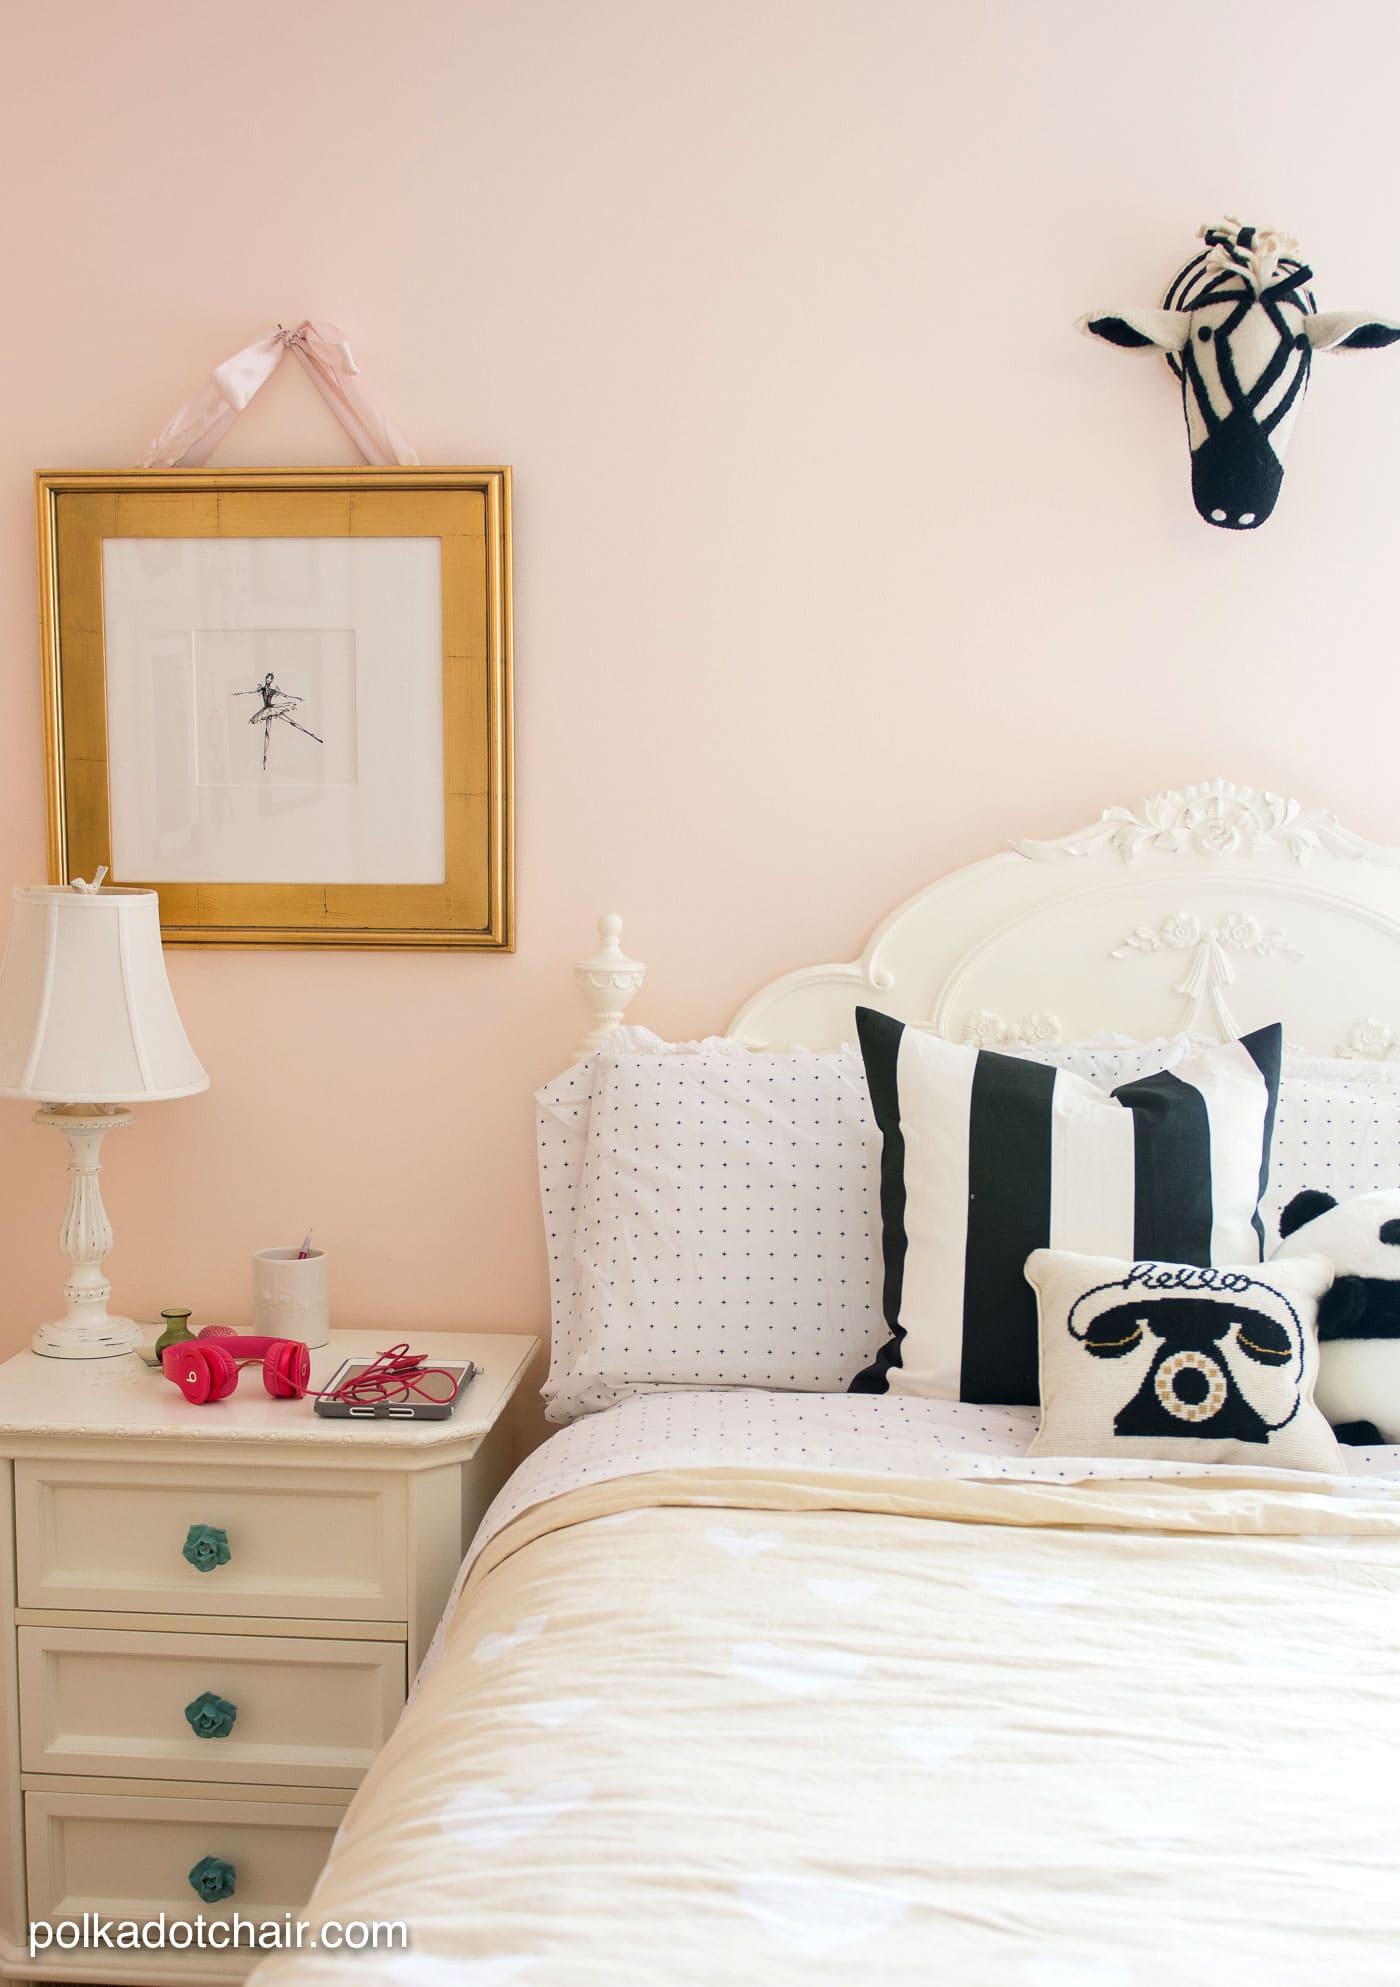 Daughters Room Decorating Ideas